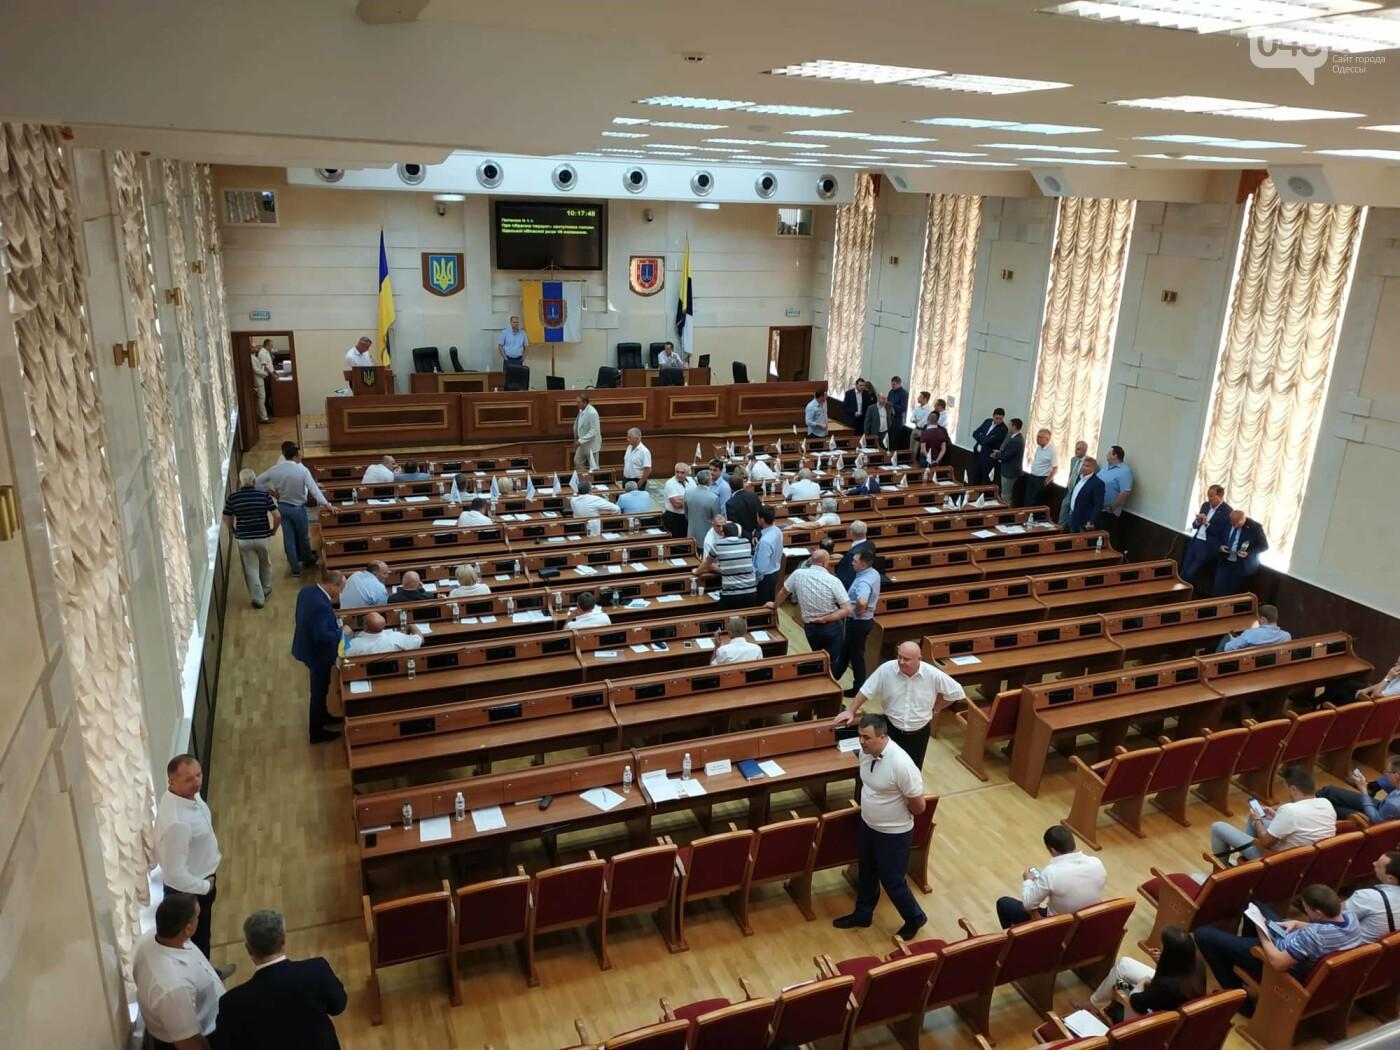 Стало известно, кто возглавил Одесский областной совет, - ФОТО, фото-11, Фото: Александр Жирносенко